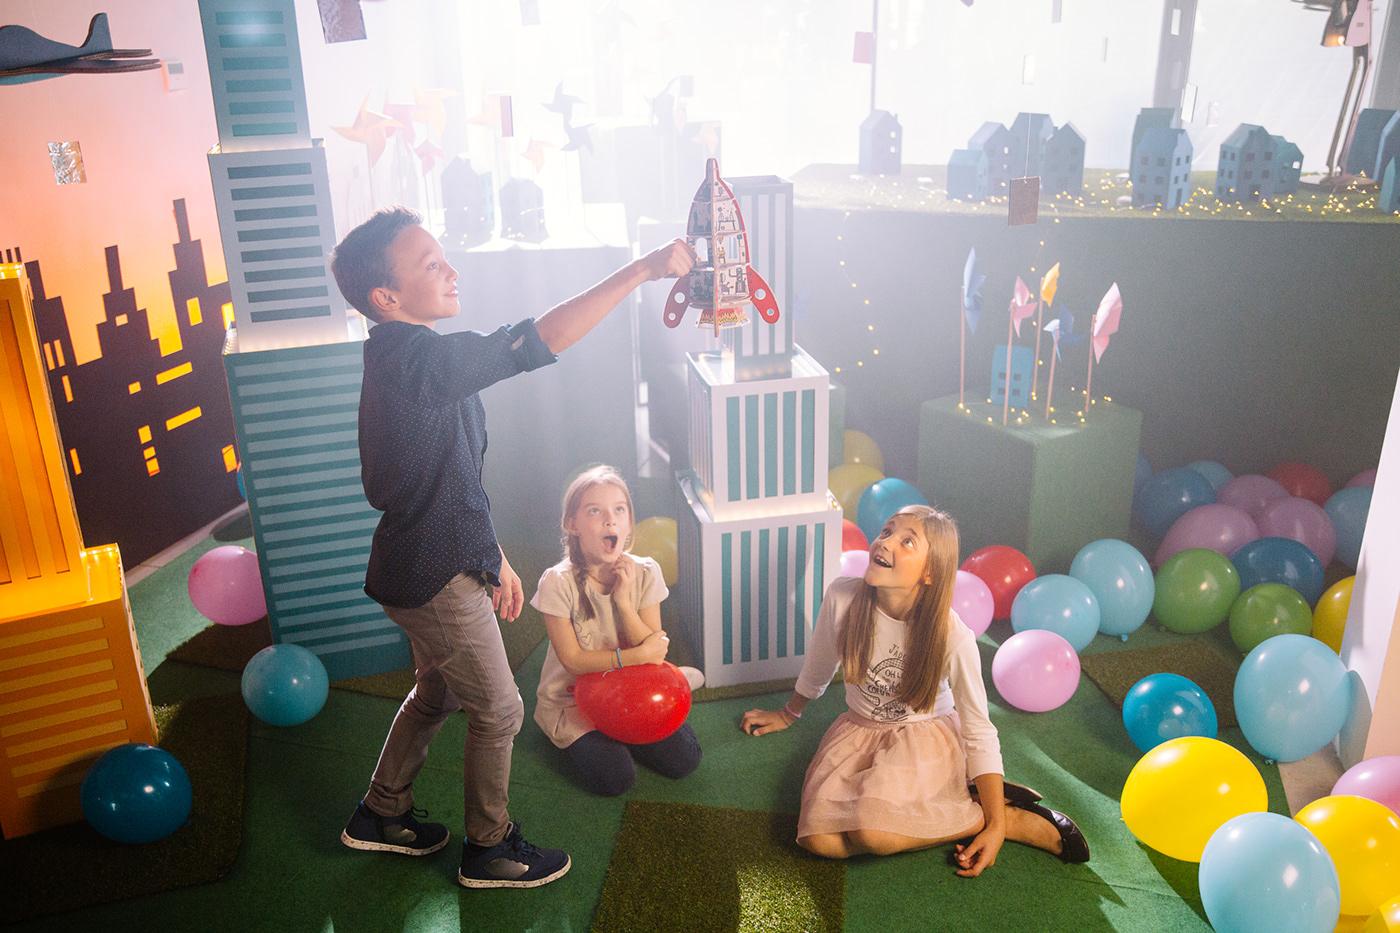 energy child children spot tv colours happyness home city scenography portrait